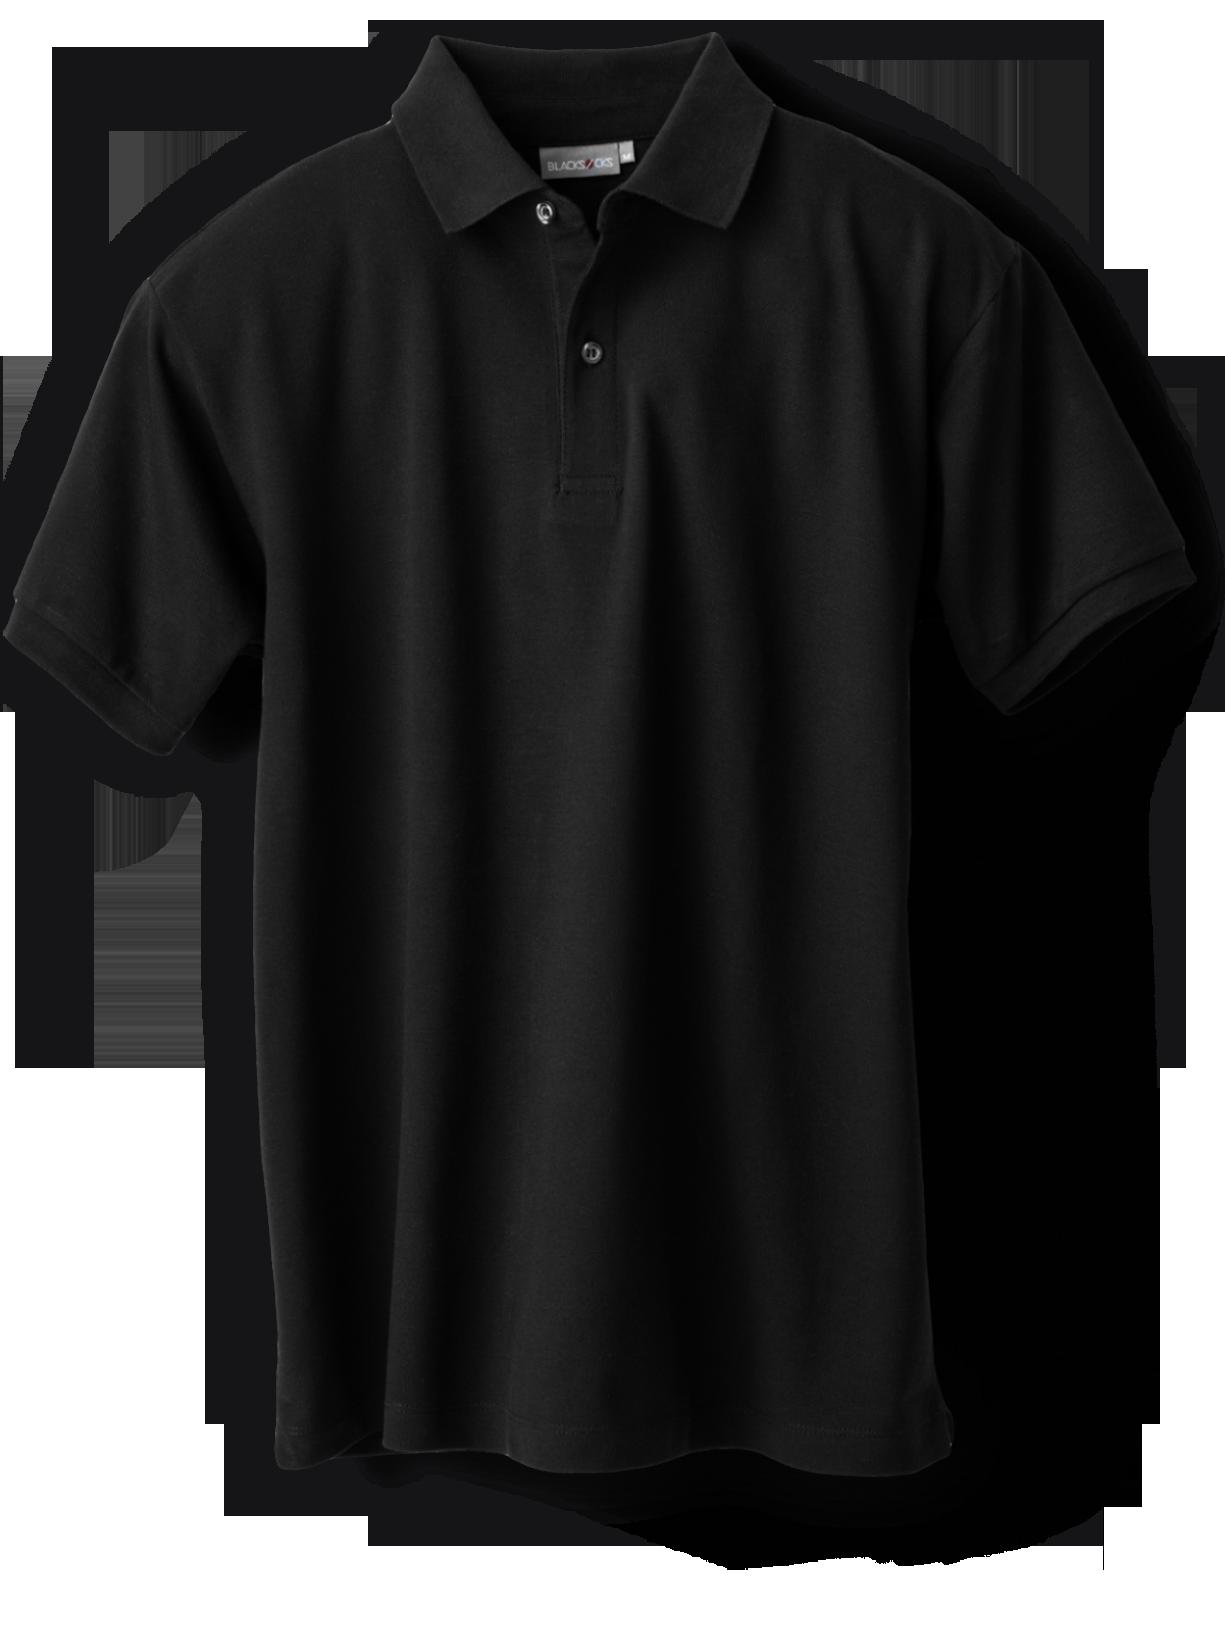 Hdpng - Polo Shirt, Transparent background PNG HD thumbnail